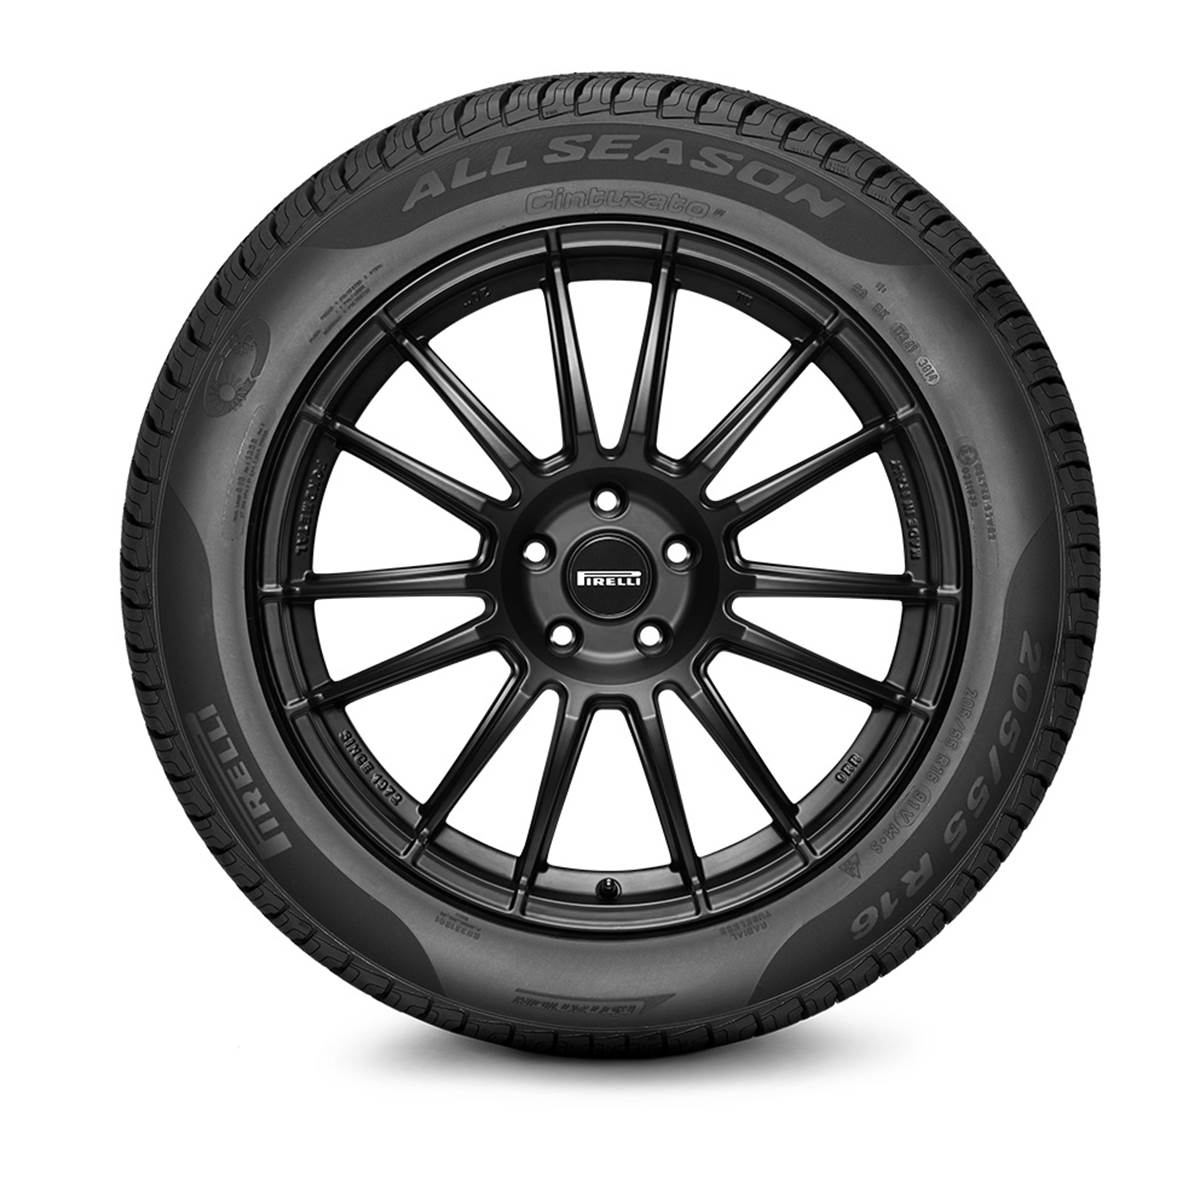 Pneu 4 Saisons Pirelli 205/50R17 93W Cinturato All Season +